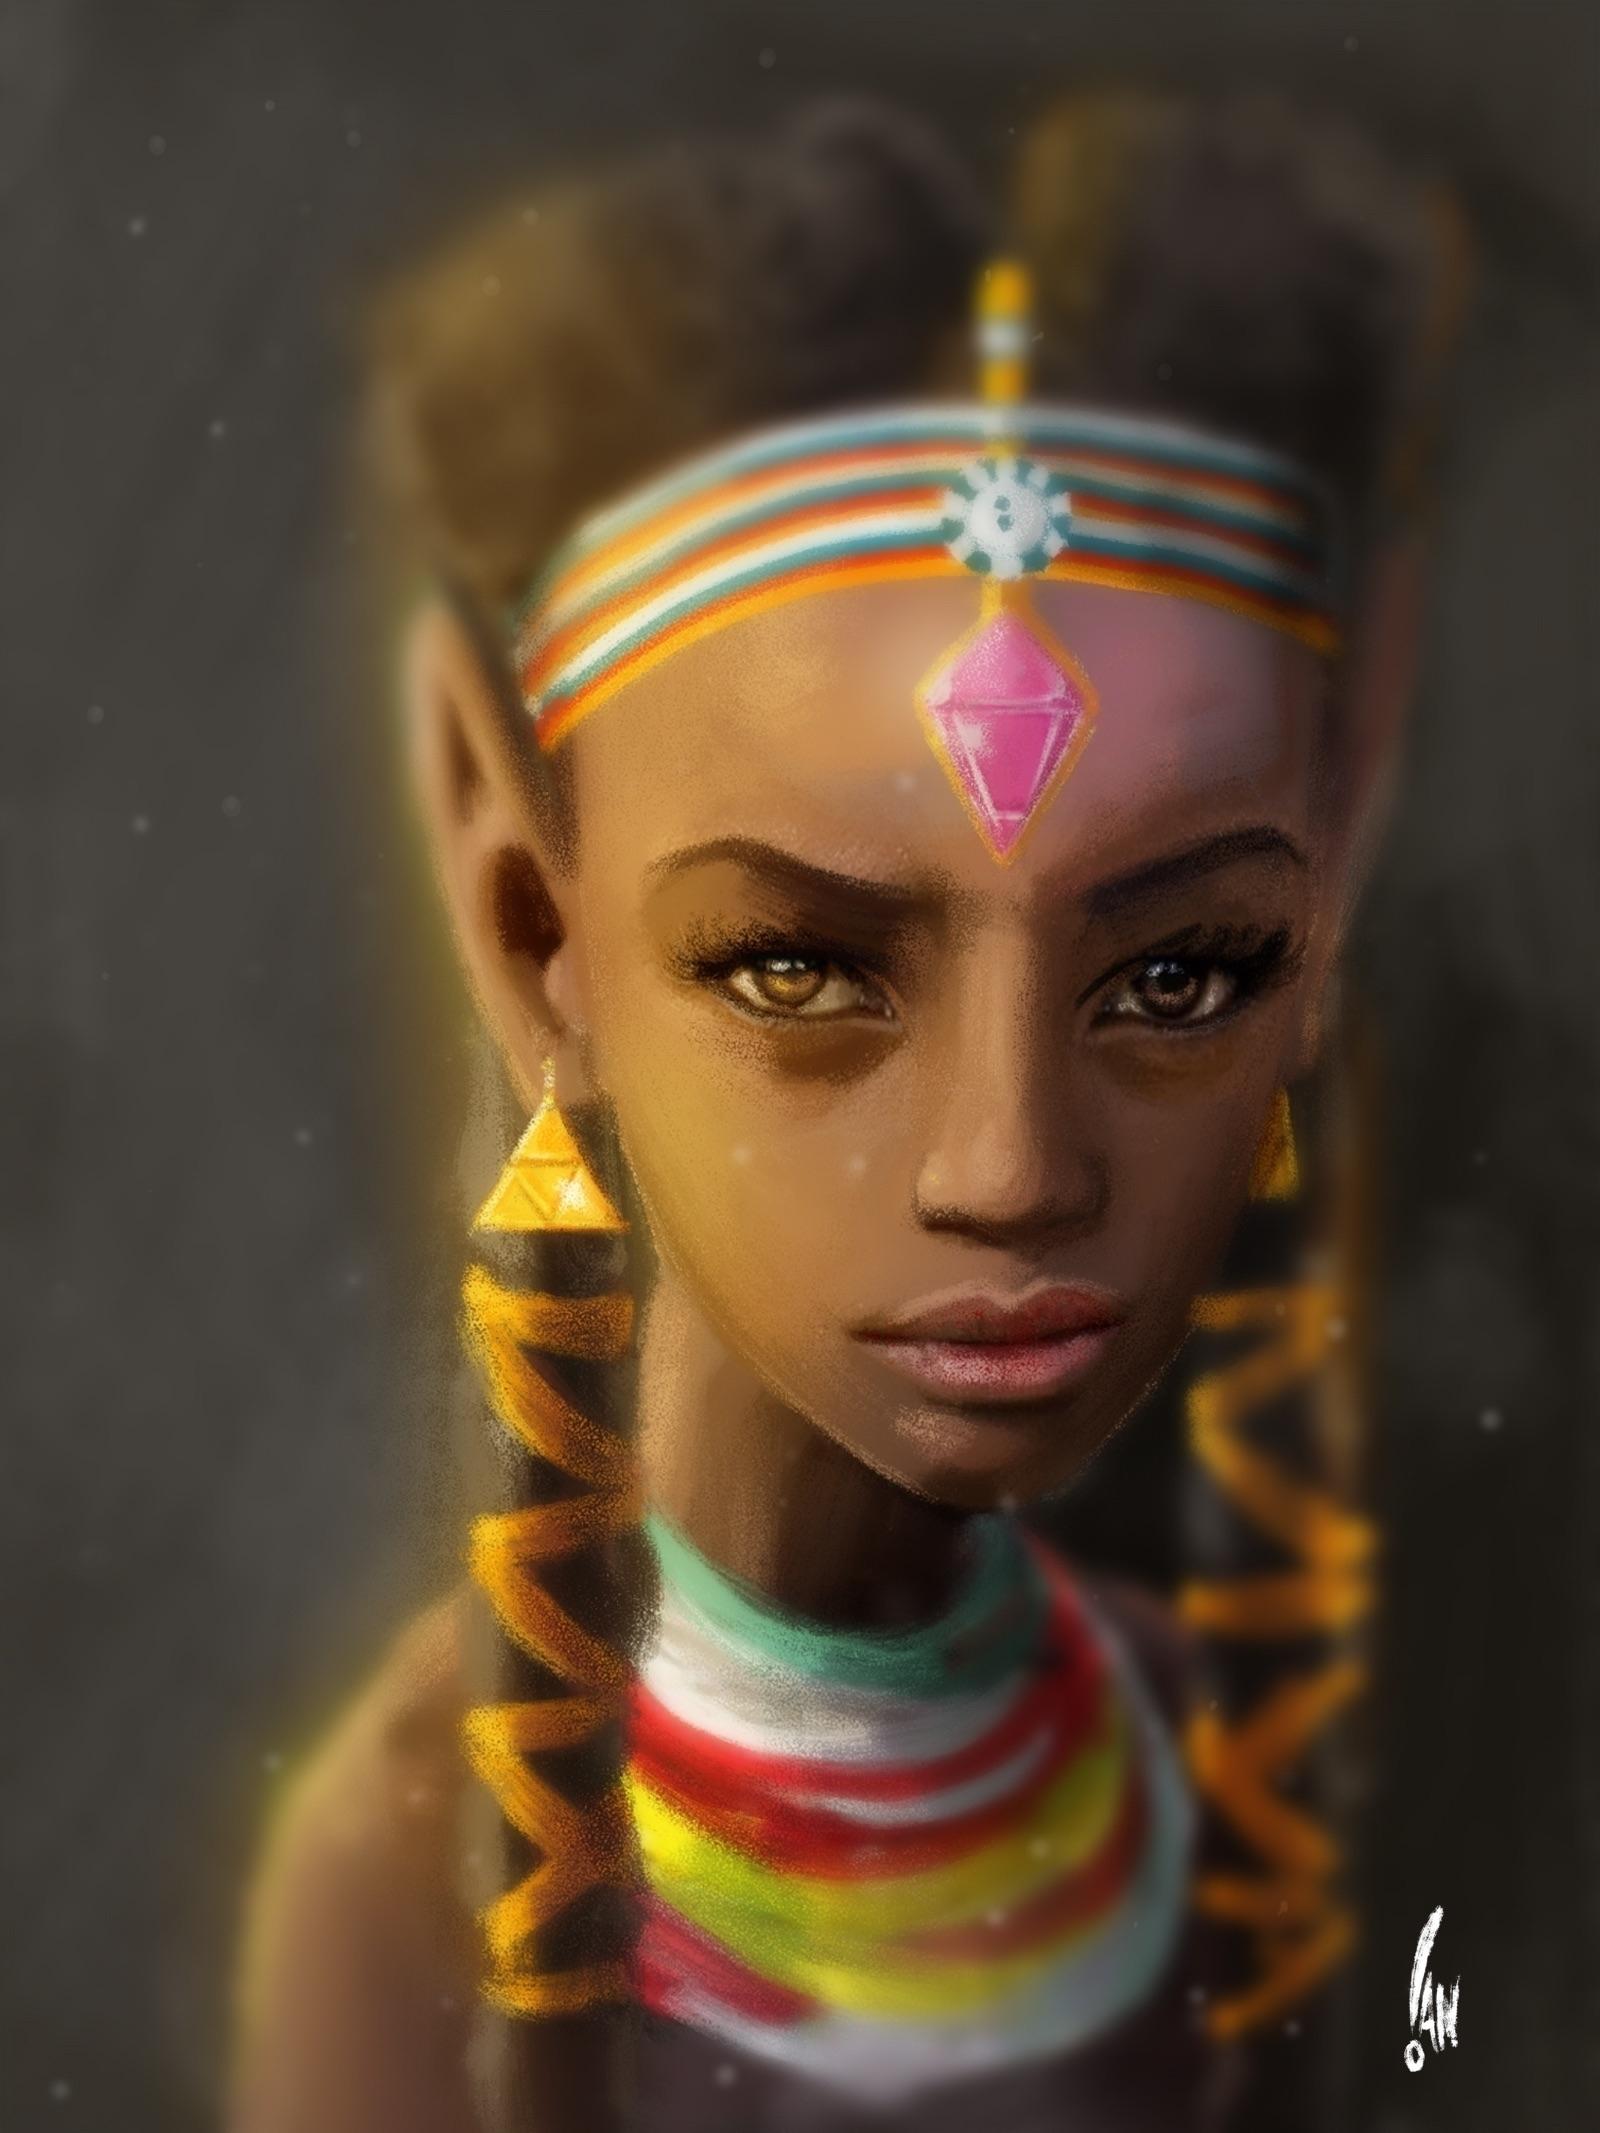 Zelda Kenya - zelda, nintendo, Wacom - sketchian-5498 | ello